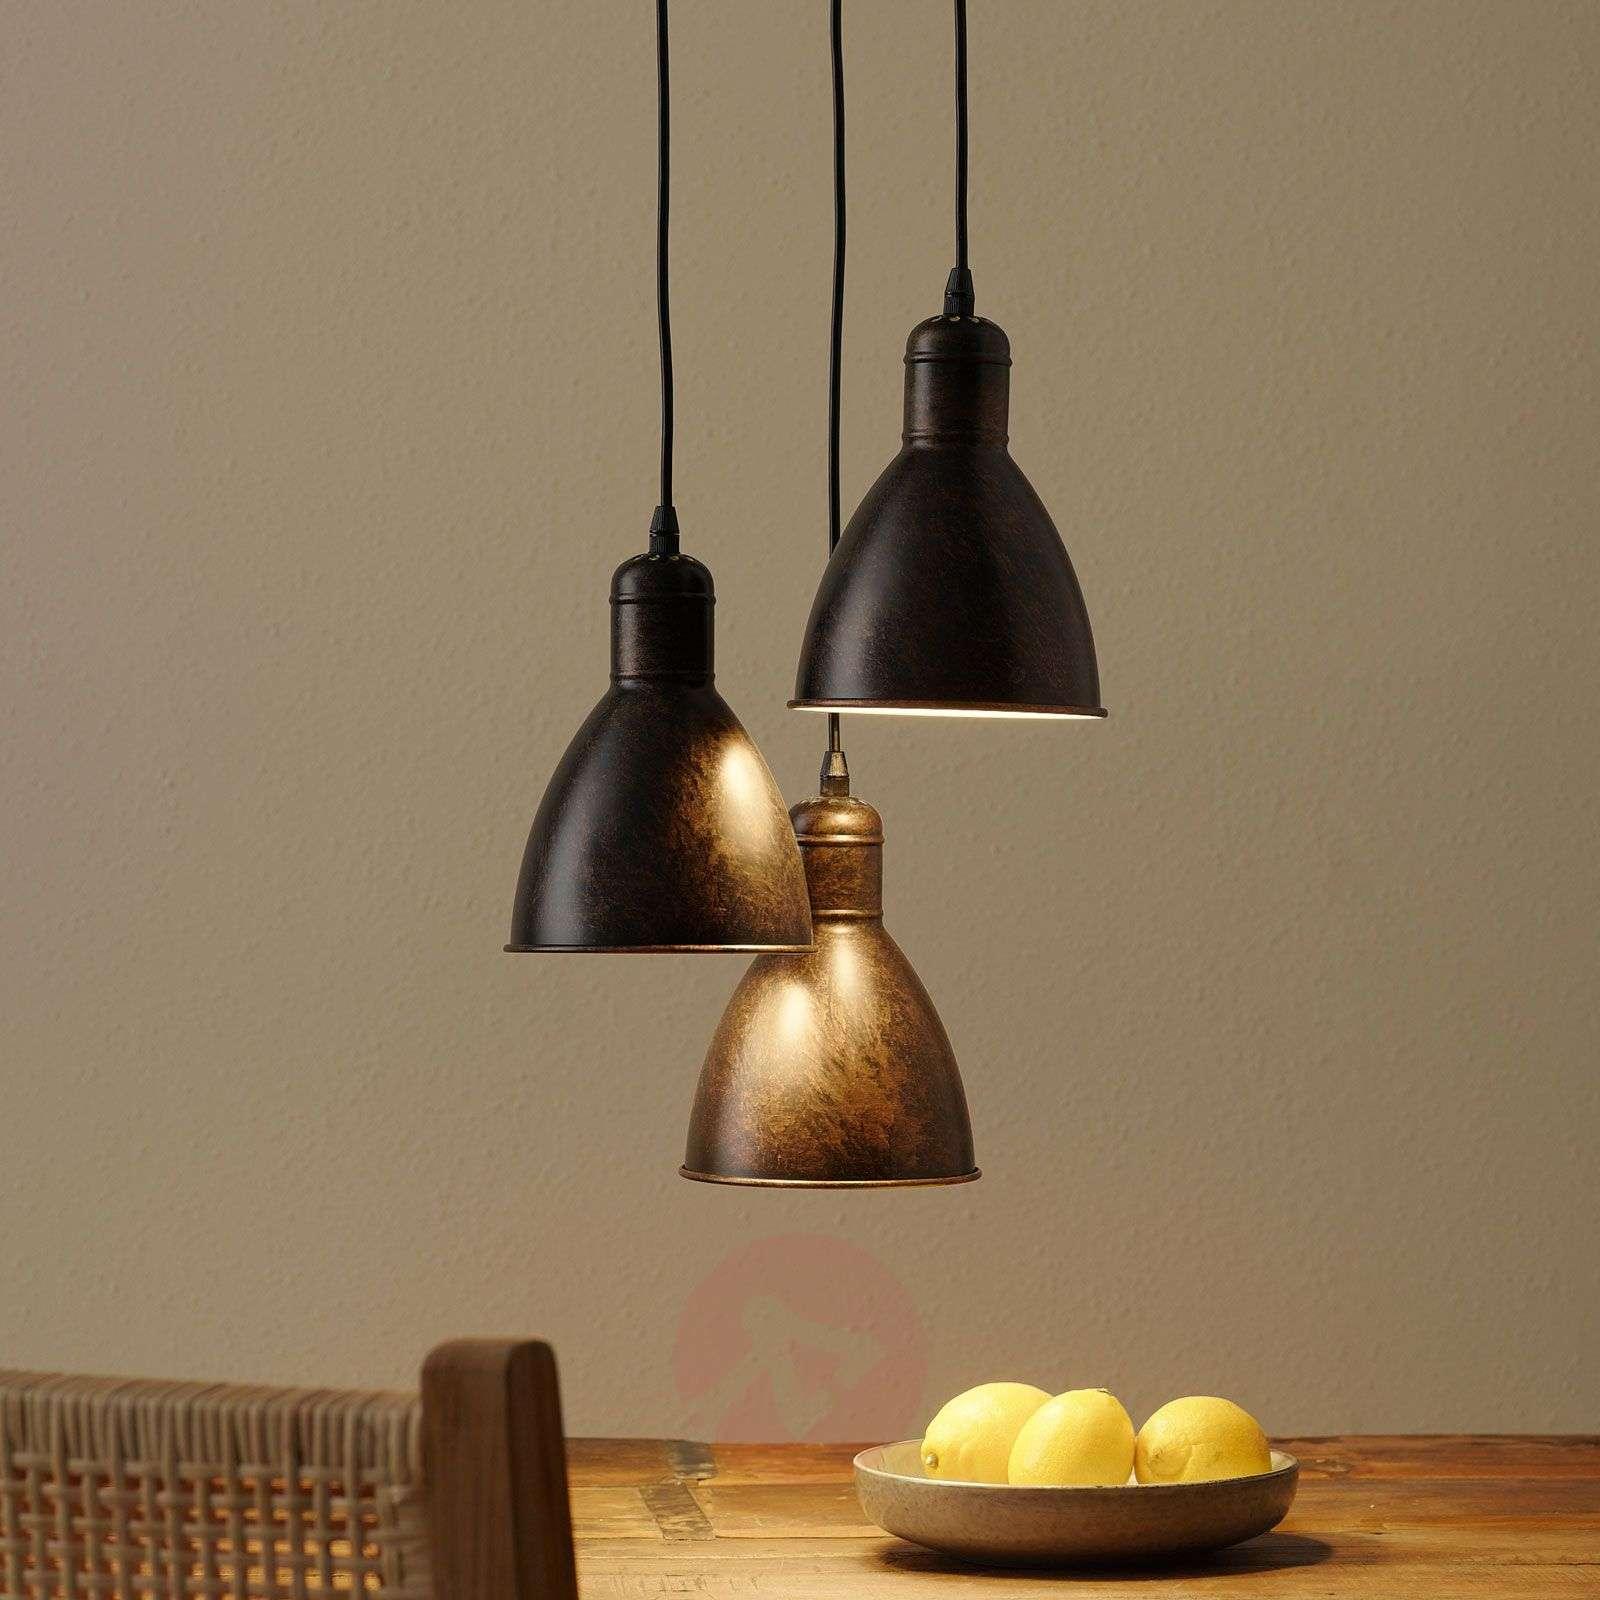 Priddy 1 vintage-riippuvalo 3-lampp antiikkikupari-3031784-011